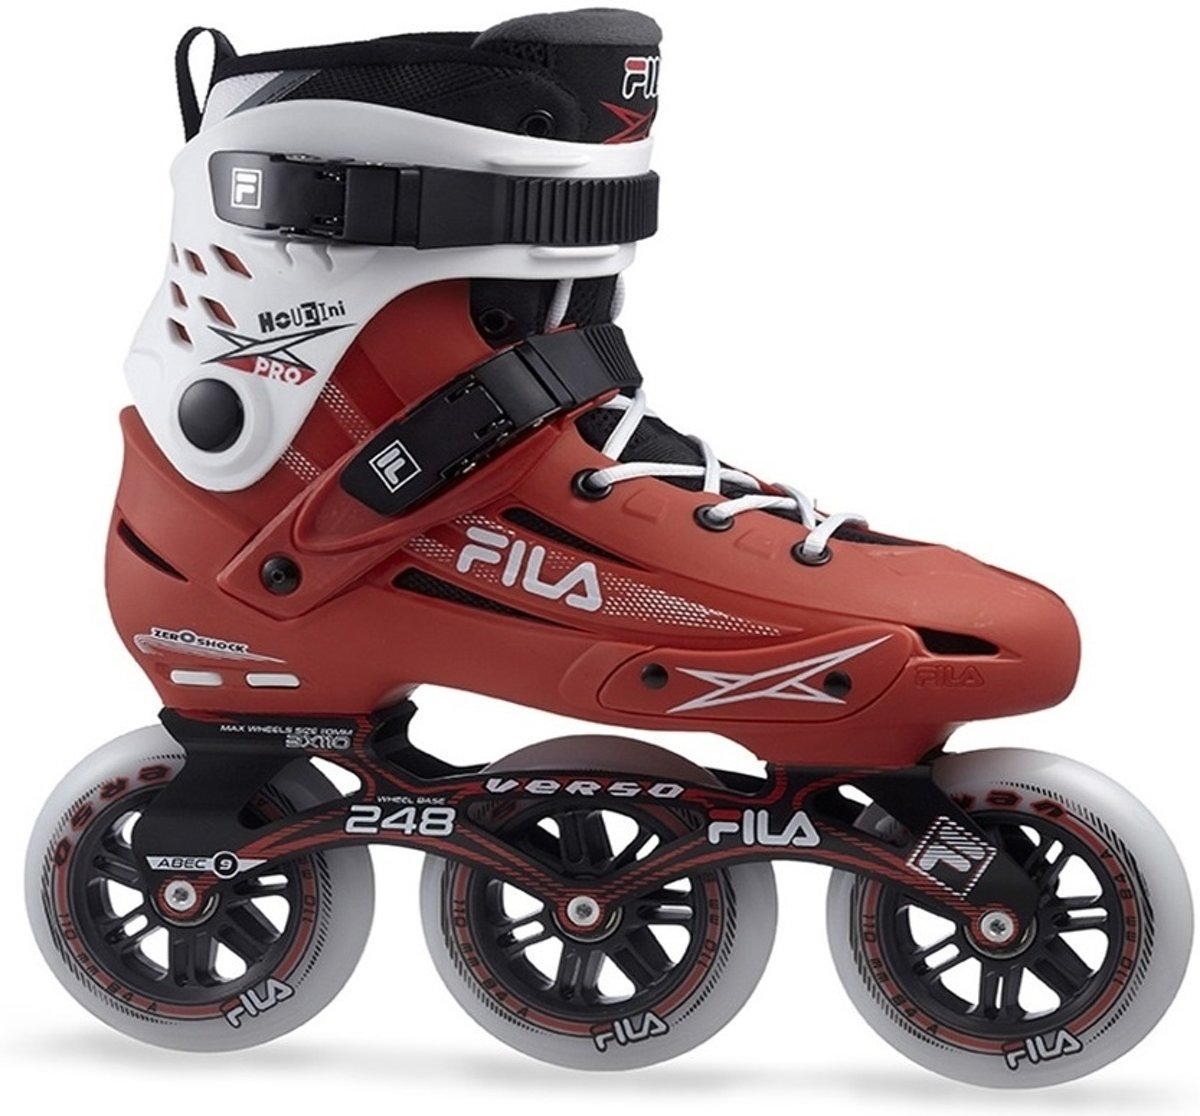 Afbeelding van product FILA INLINE SKATES, HOUDINI PRO 110  - maat 42.5